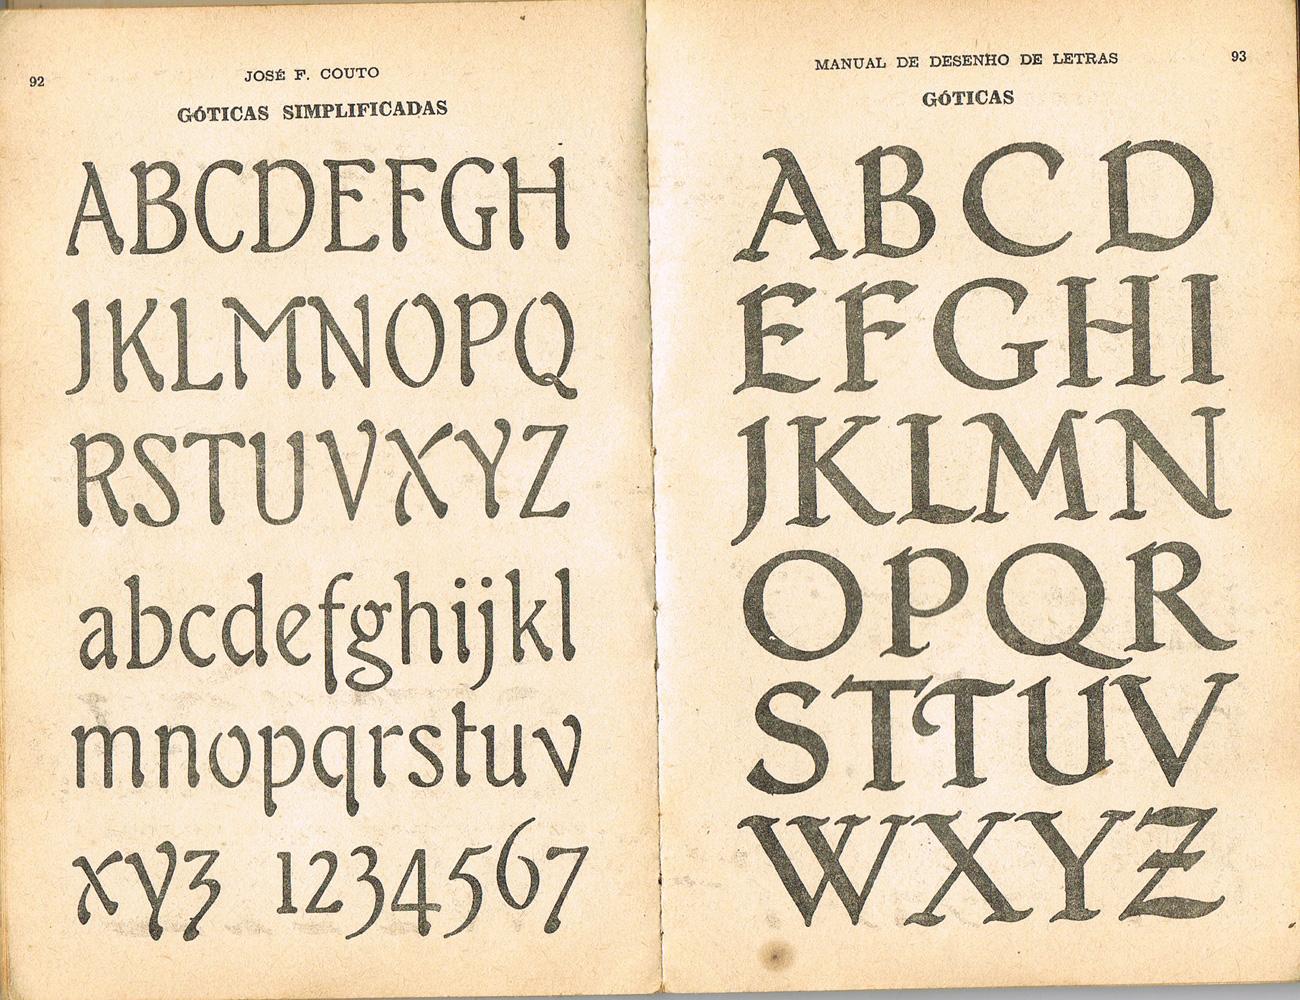 Letras goticas diseos de letras auto design tech for Disenos de literas